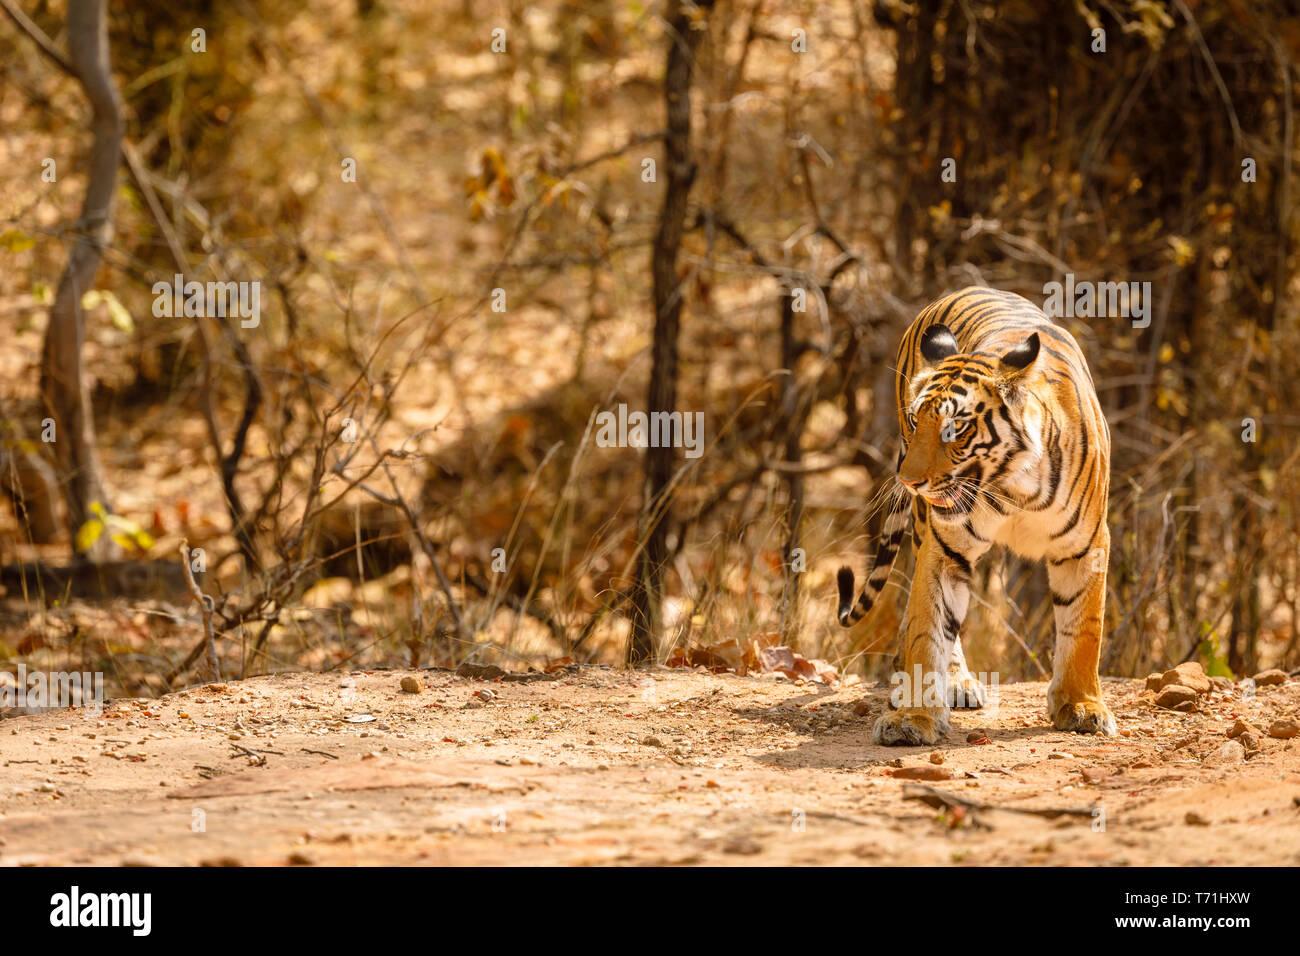 Tigress, Bengal tiger (Panthera tigris) in Bandhavgarh National Park in the Umaria district of the central Indian state of Madhya Pradesh - Stock Image